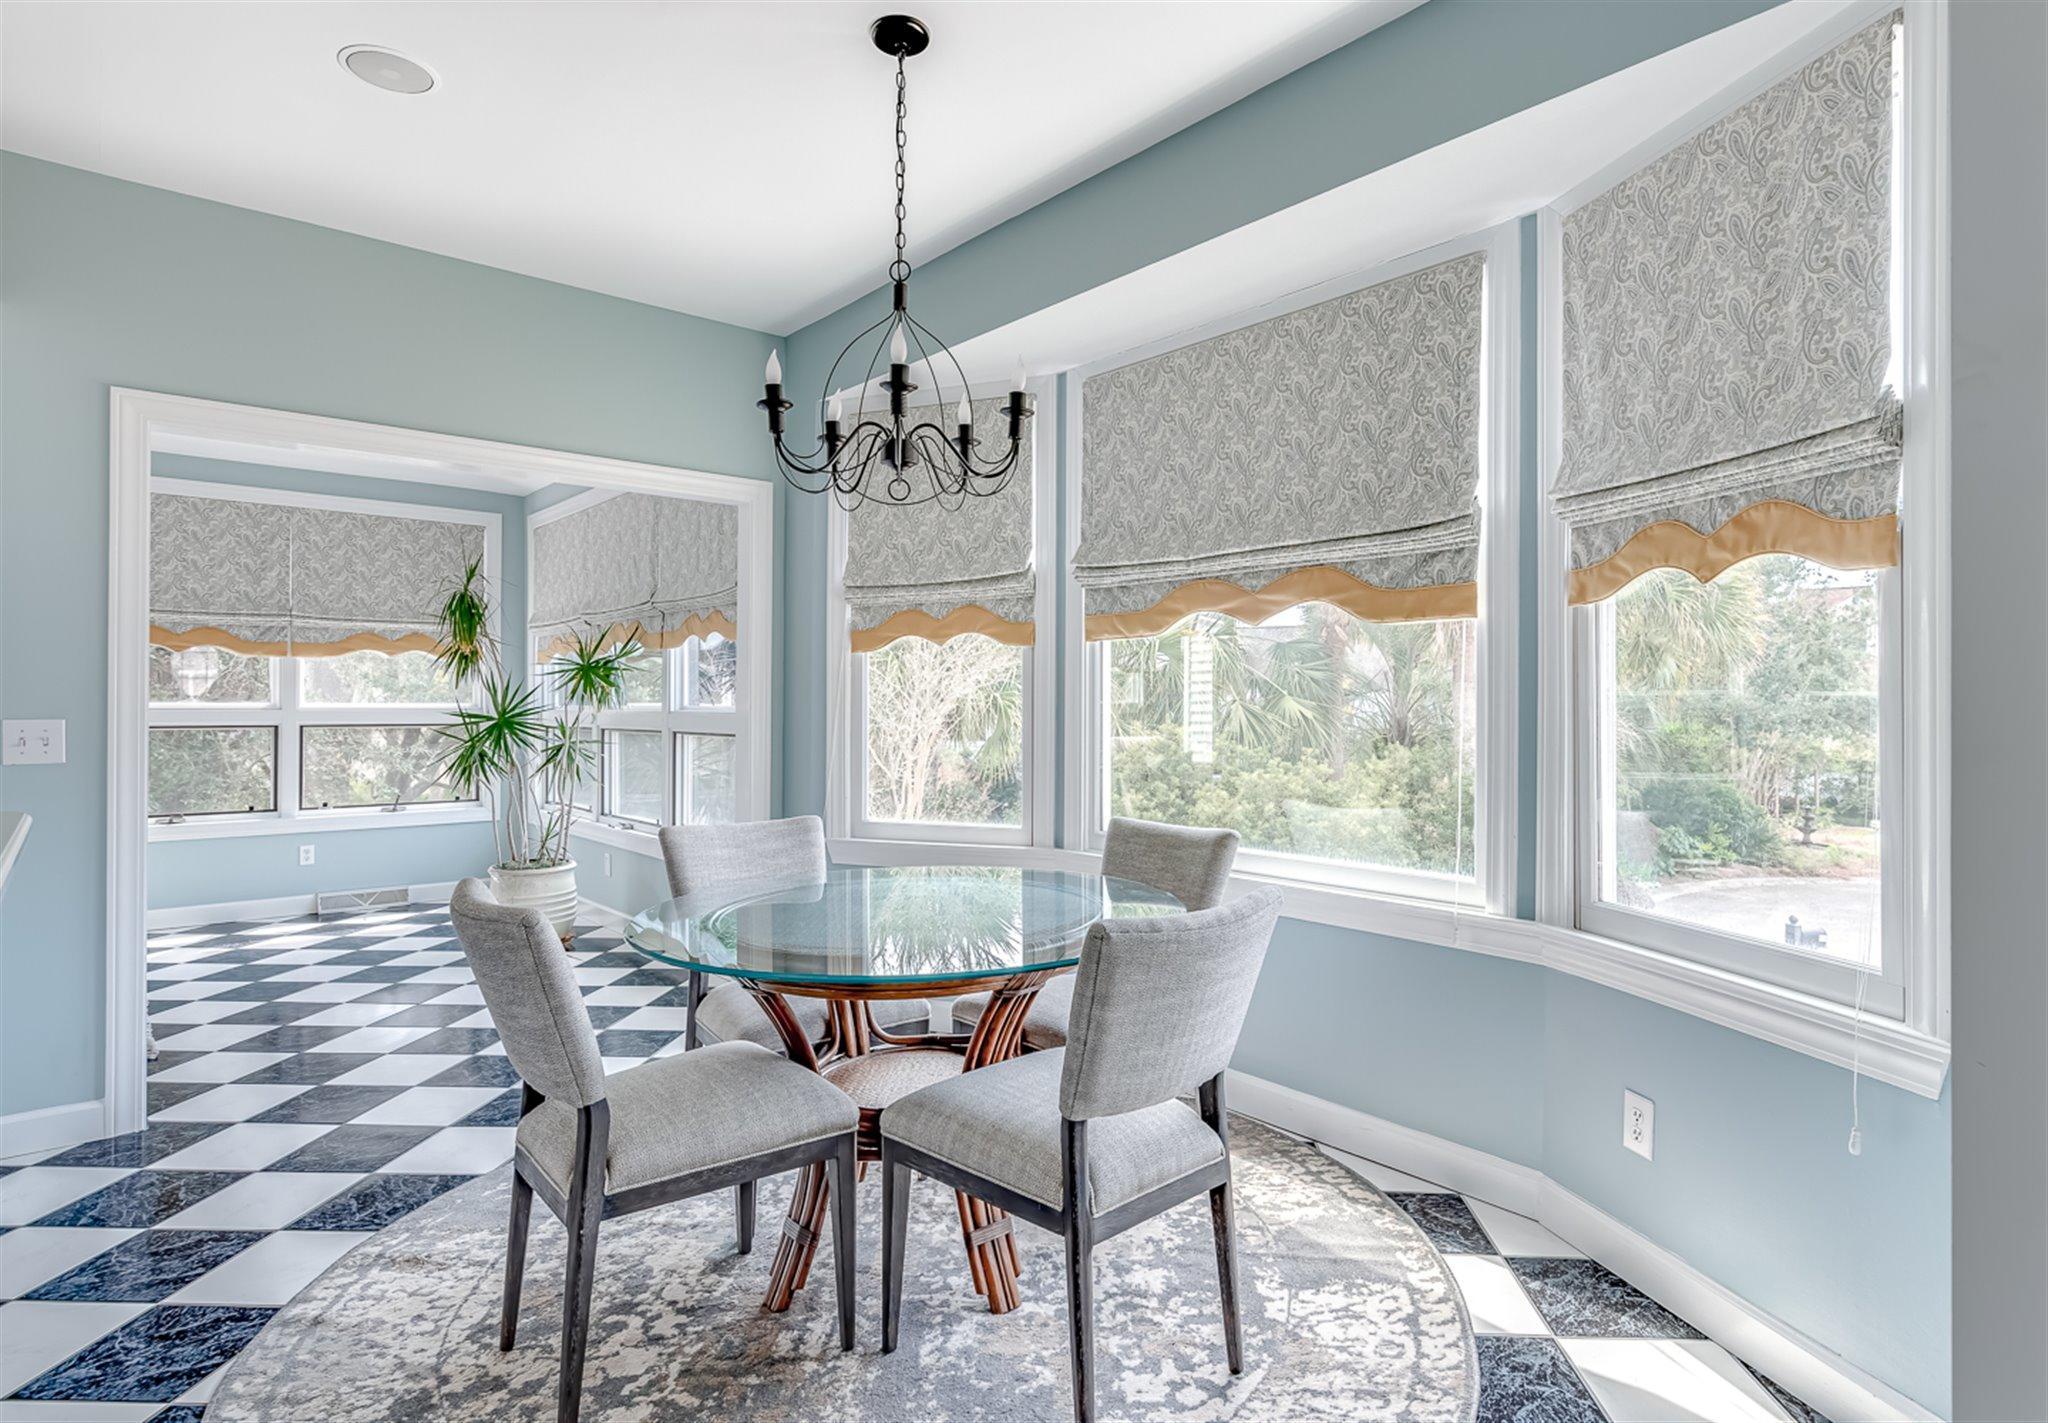 Indigo Point Homes For Sale - 50 Indigo Point, Charleston, SC - 32